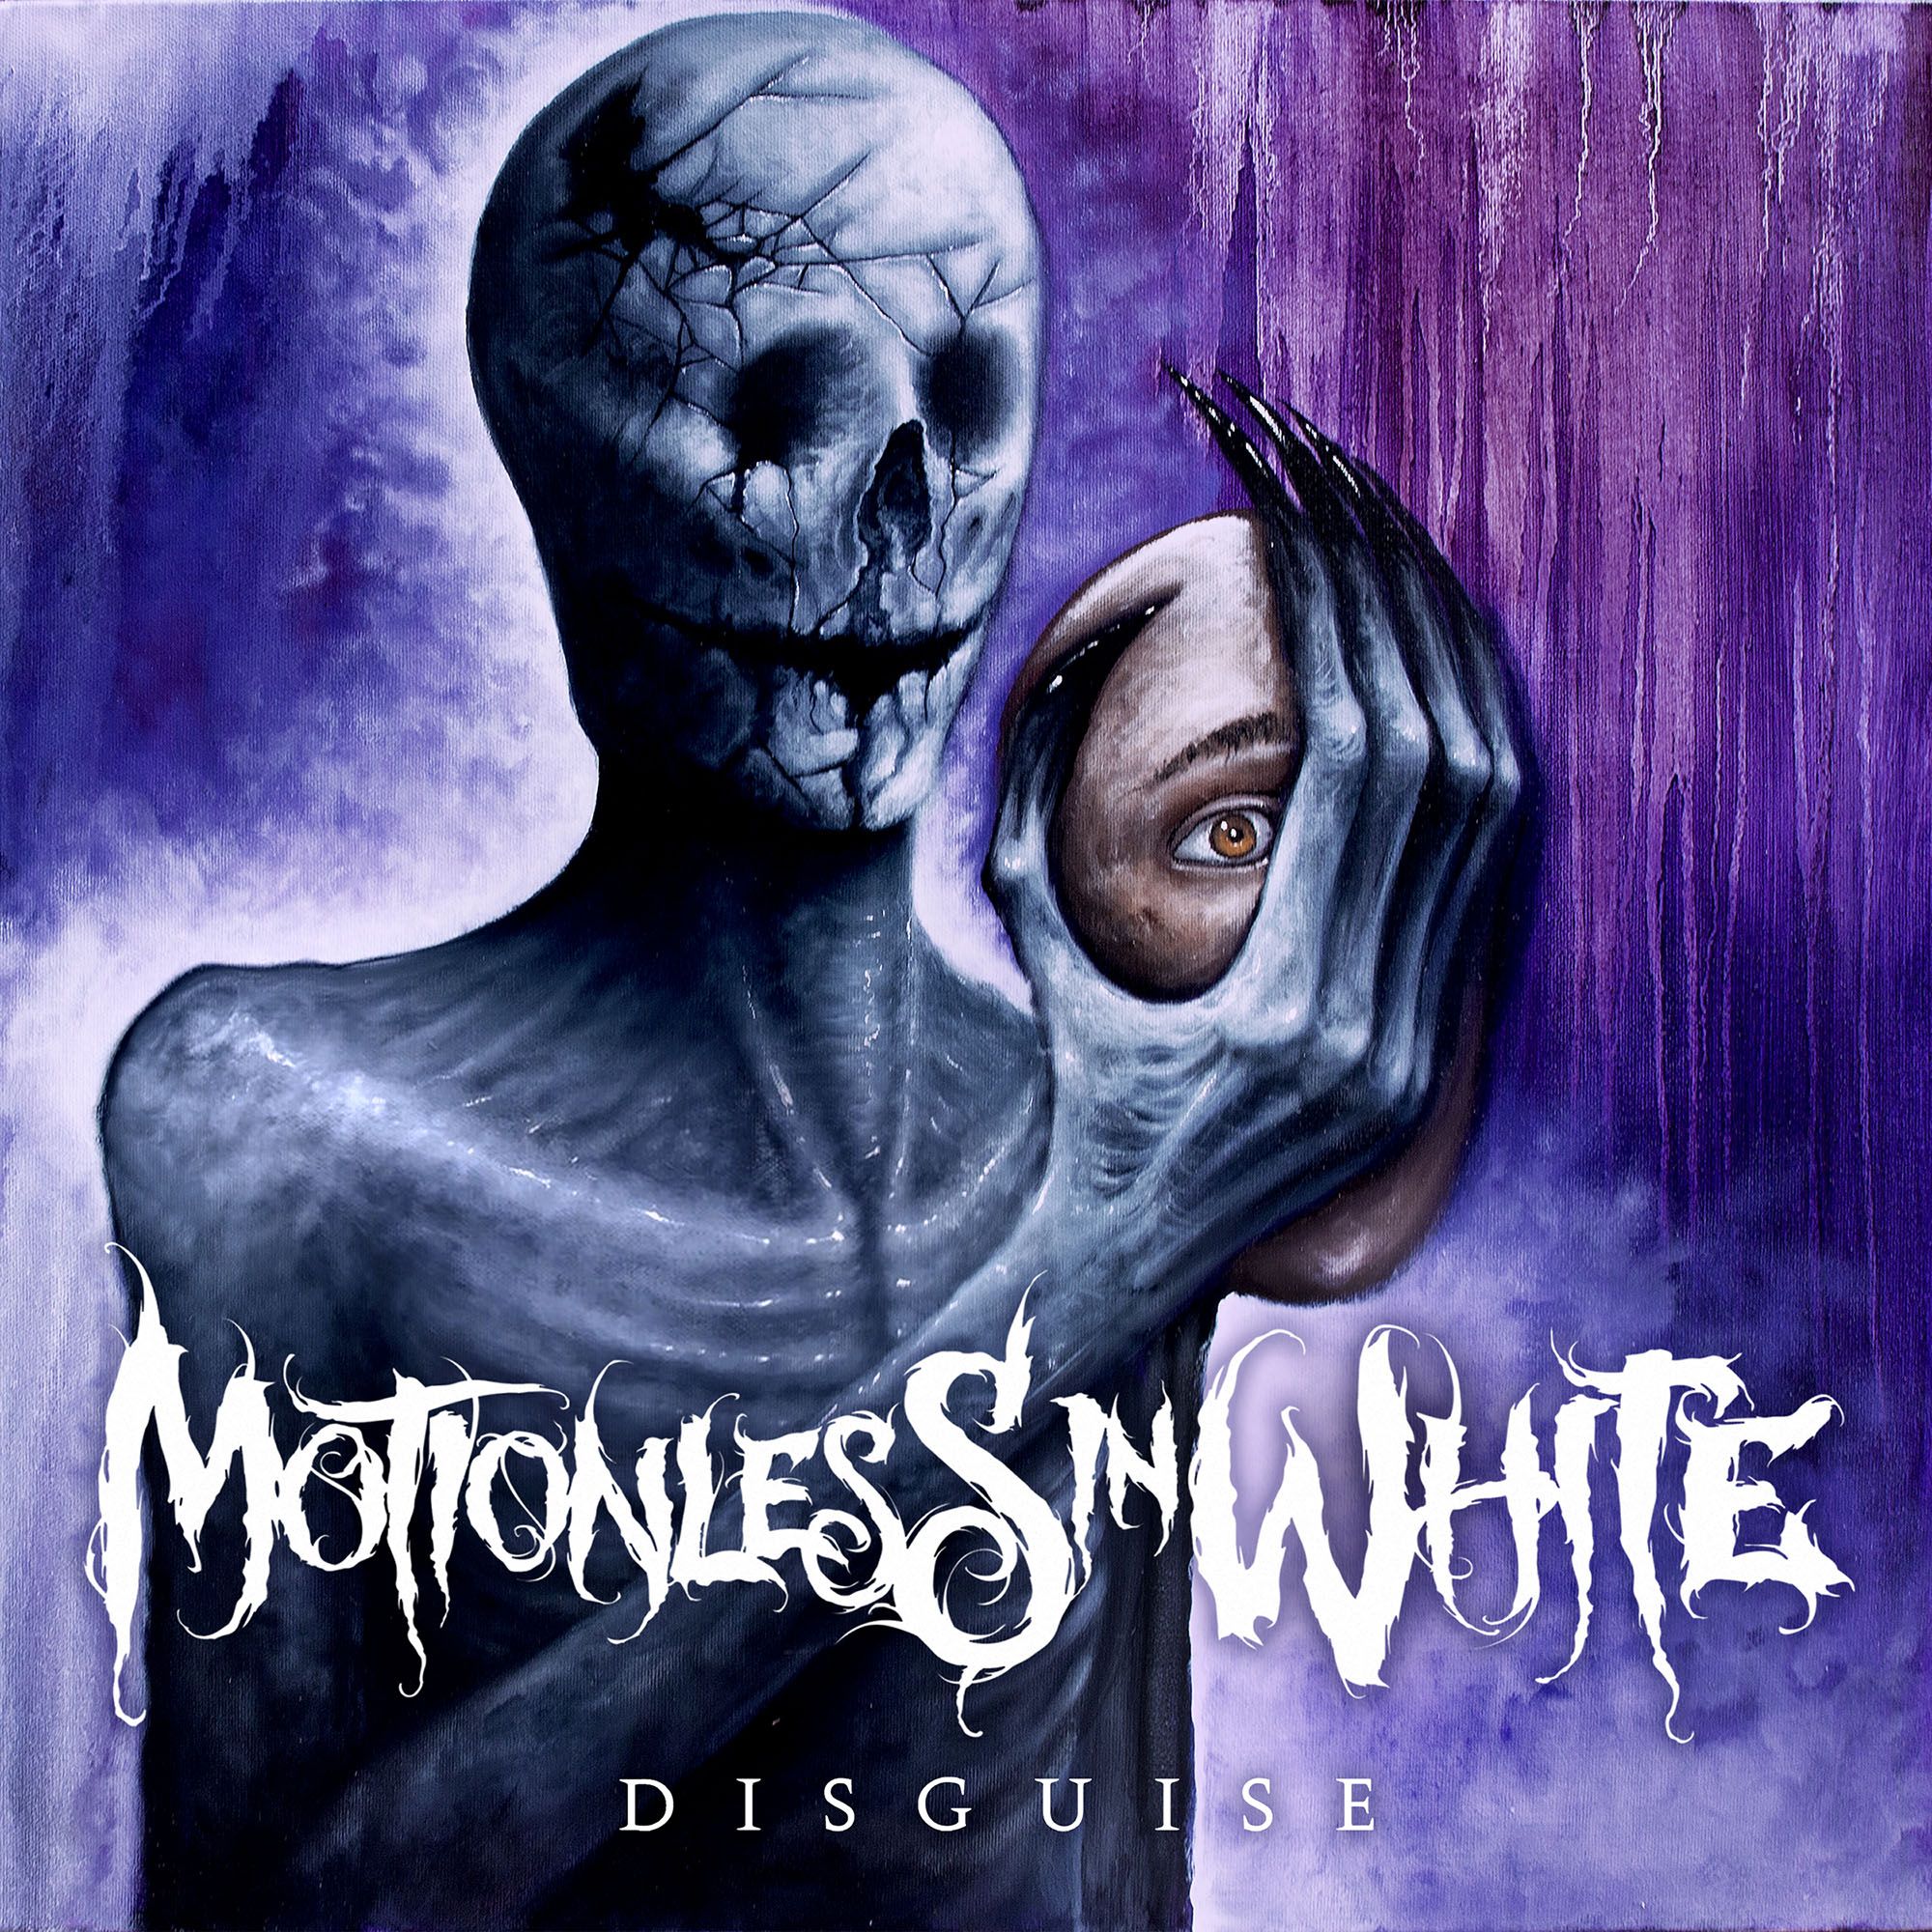 MIW-Disguise-Album-Art-LO.jpg?fit=2000,2